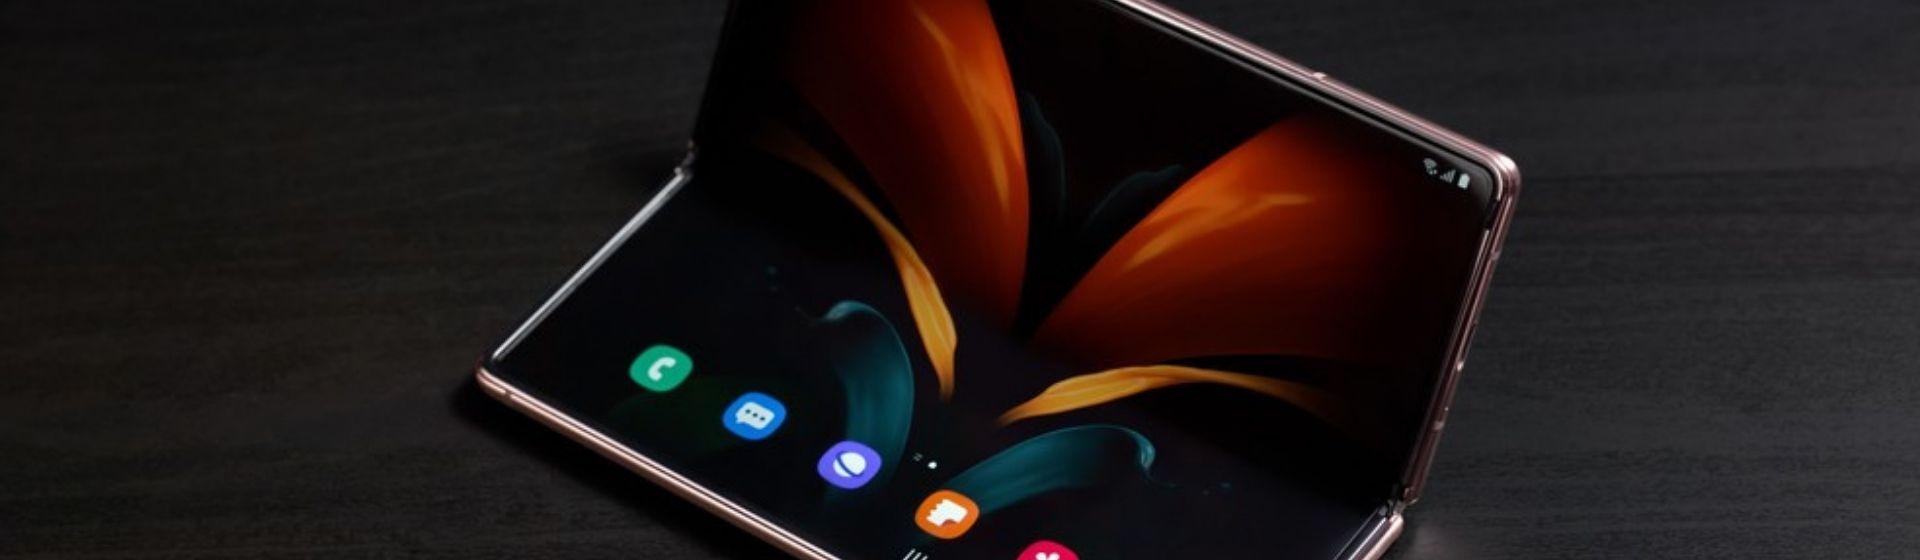 Galaxy Z Fold 2: celular dobrável da Samsung vale a pena?